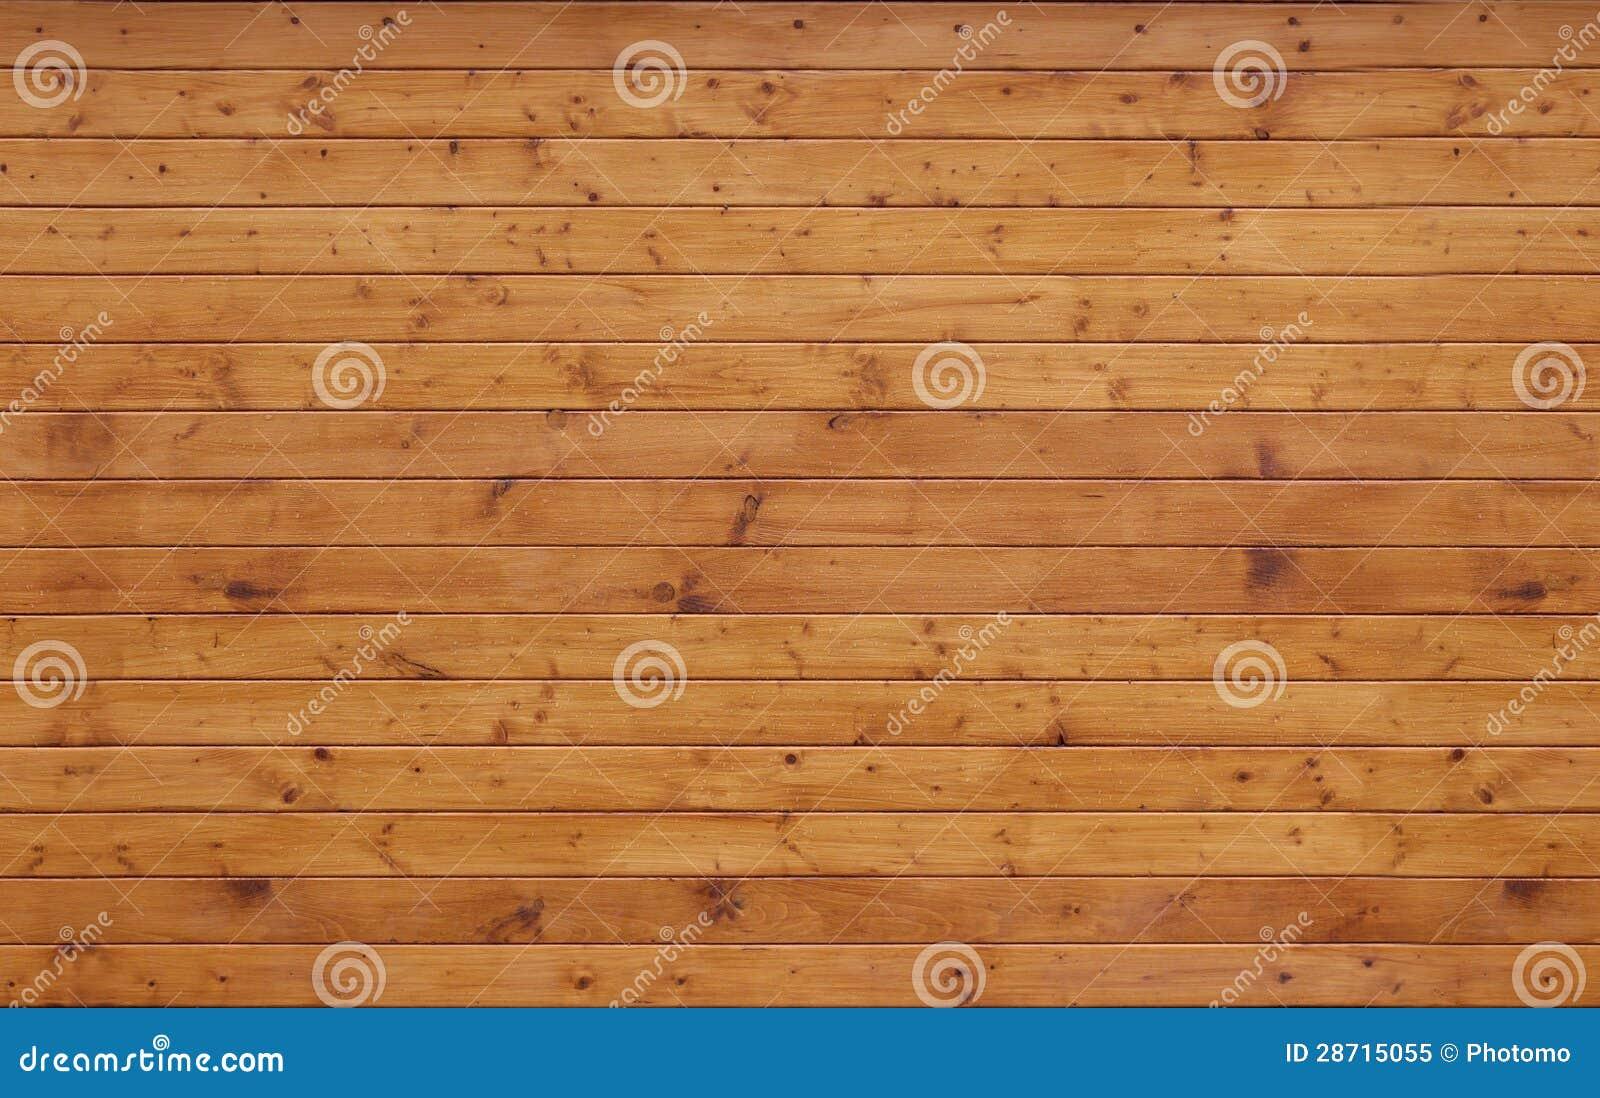 Wet Wood texture tilable HQ